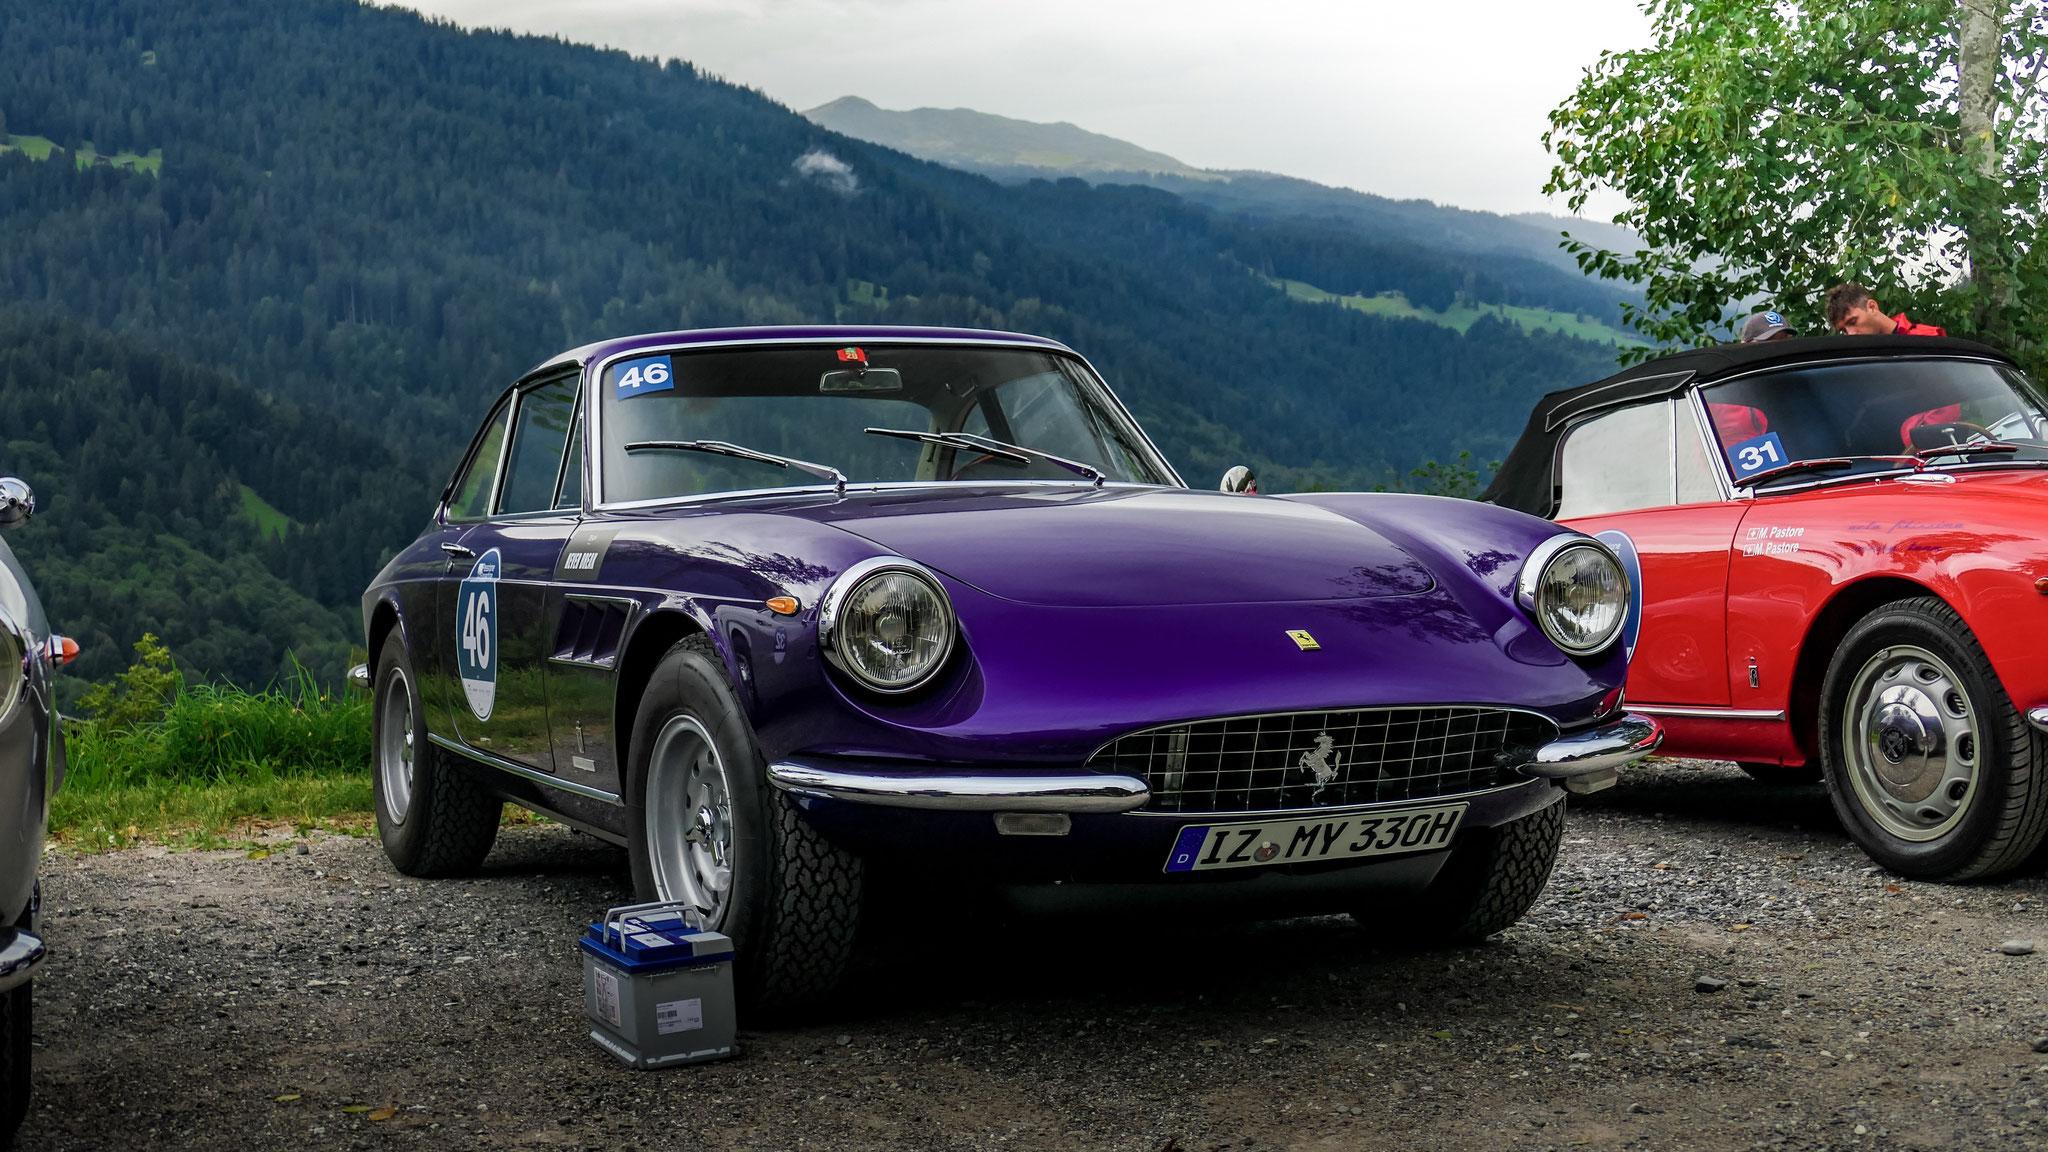 Ferrari 330 GTC - IZ-MY-330H